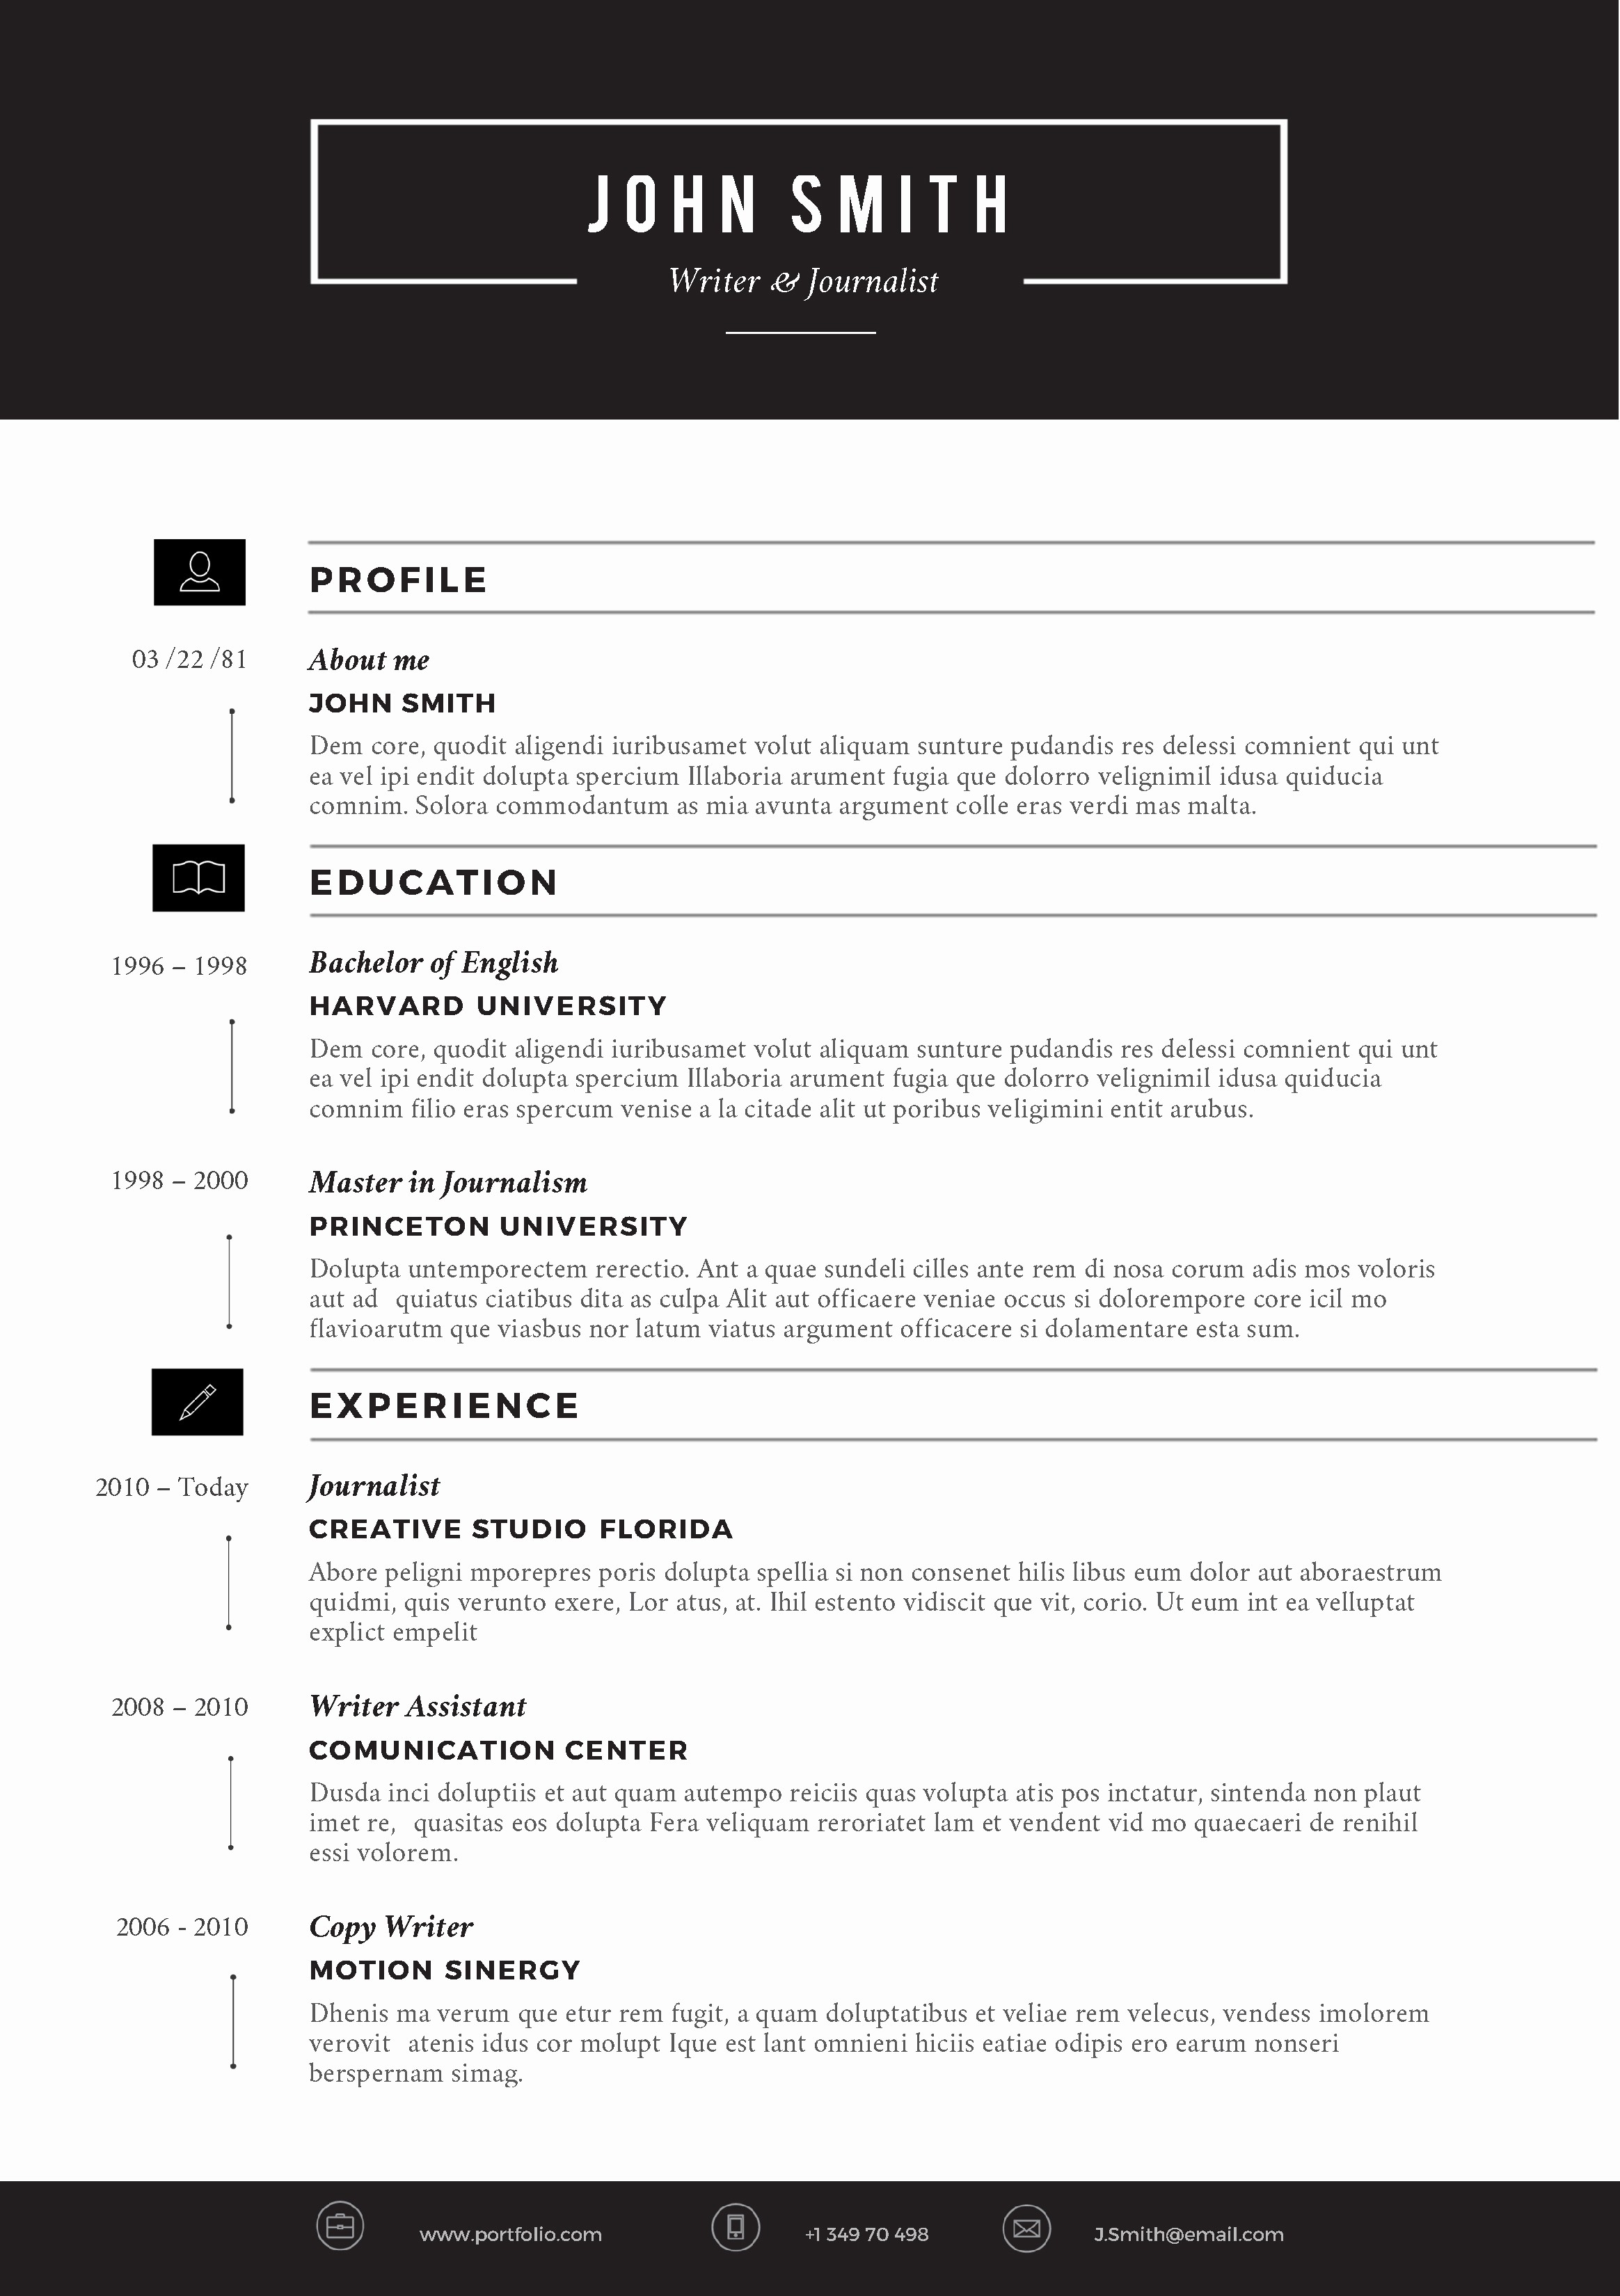 Best Free Resume Templates Word Fresh Cvfolio Best 10 Resume Templates for Microsoft Word